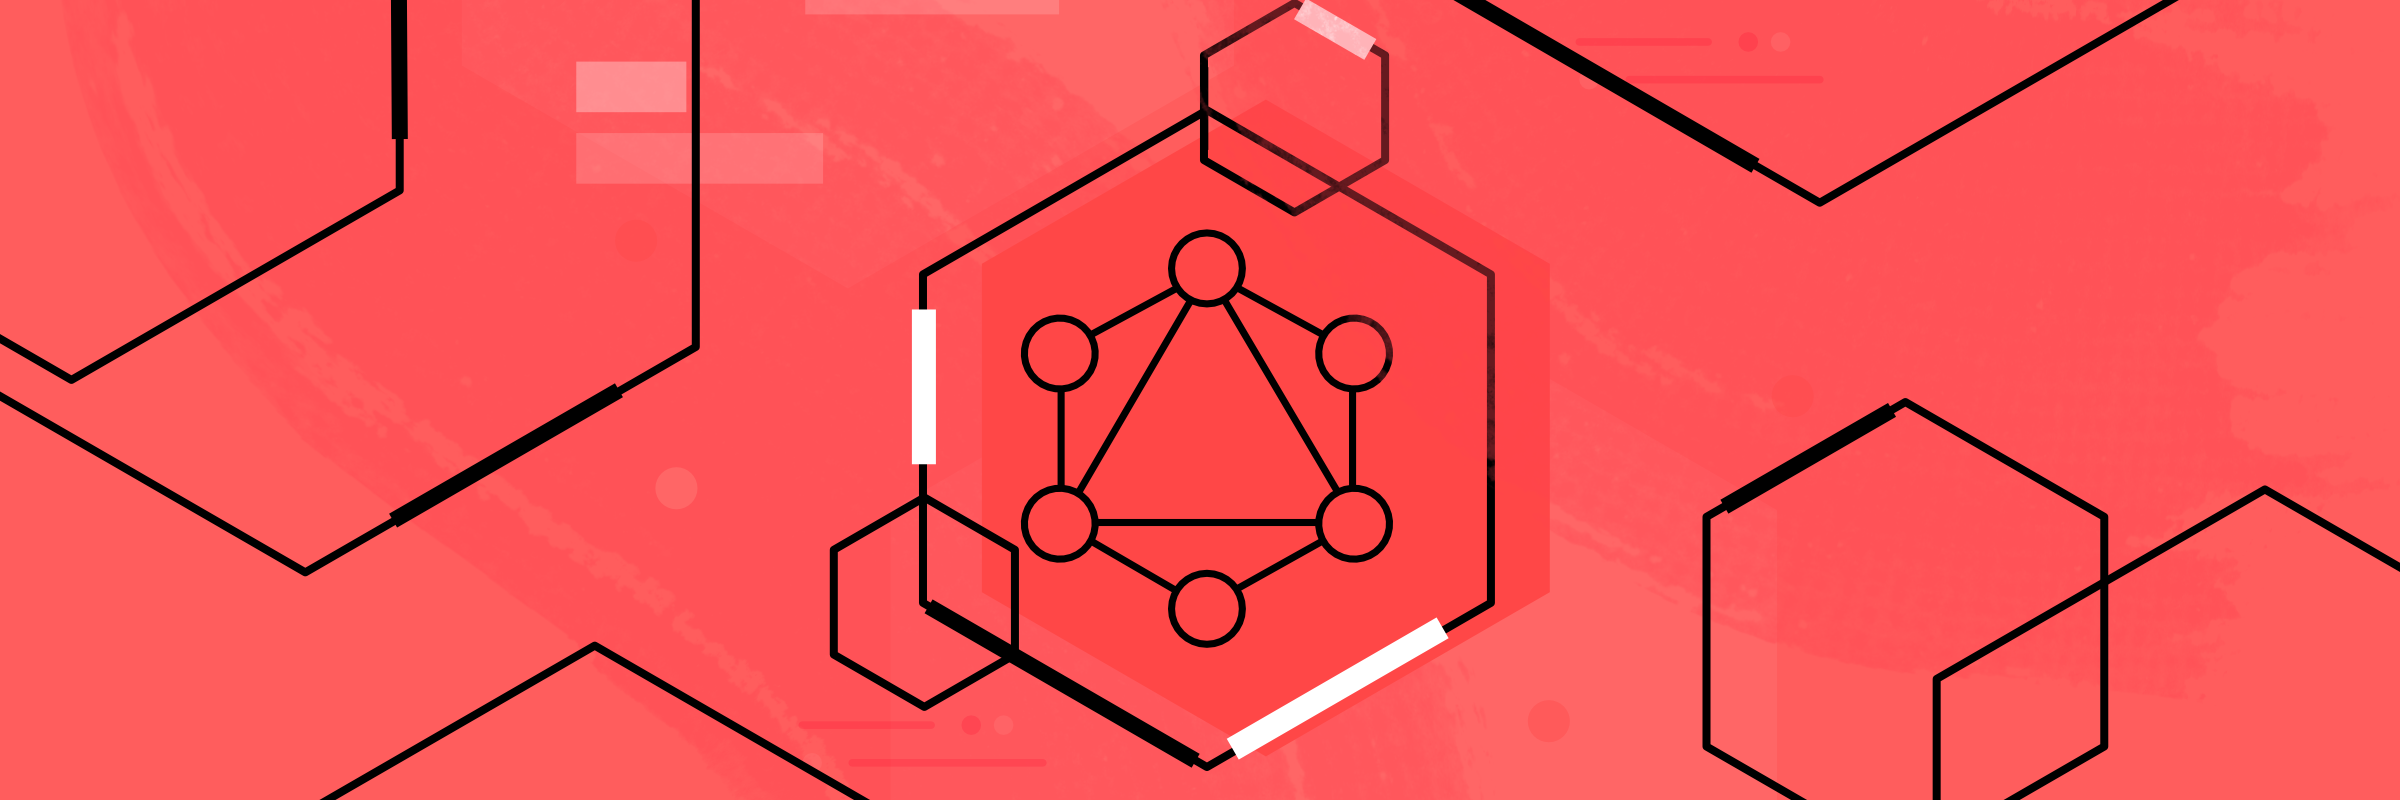 Building a GraphQL Server using NodeJS and Express